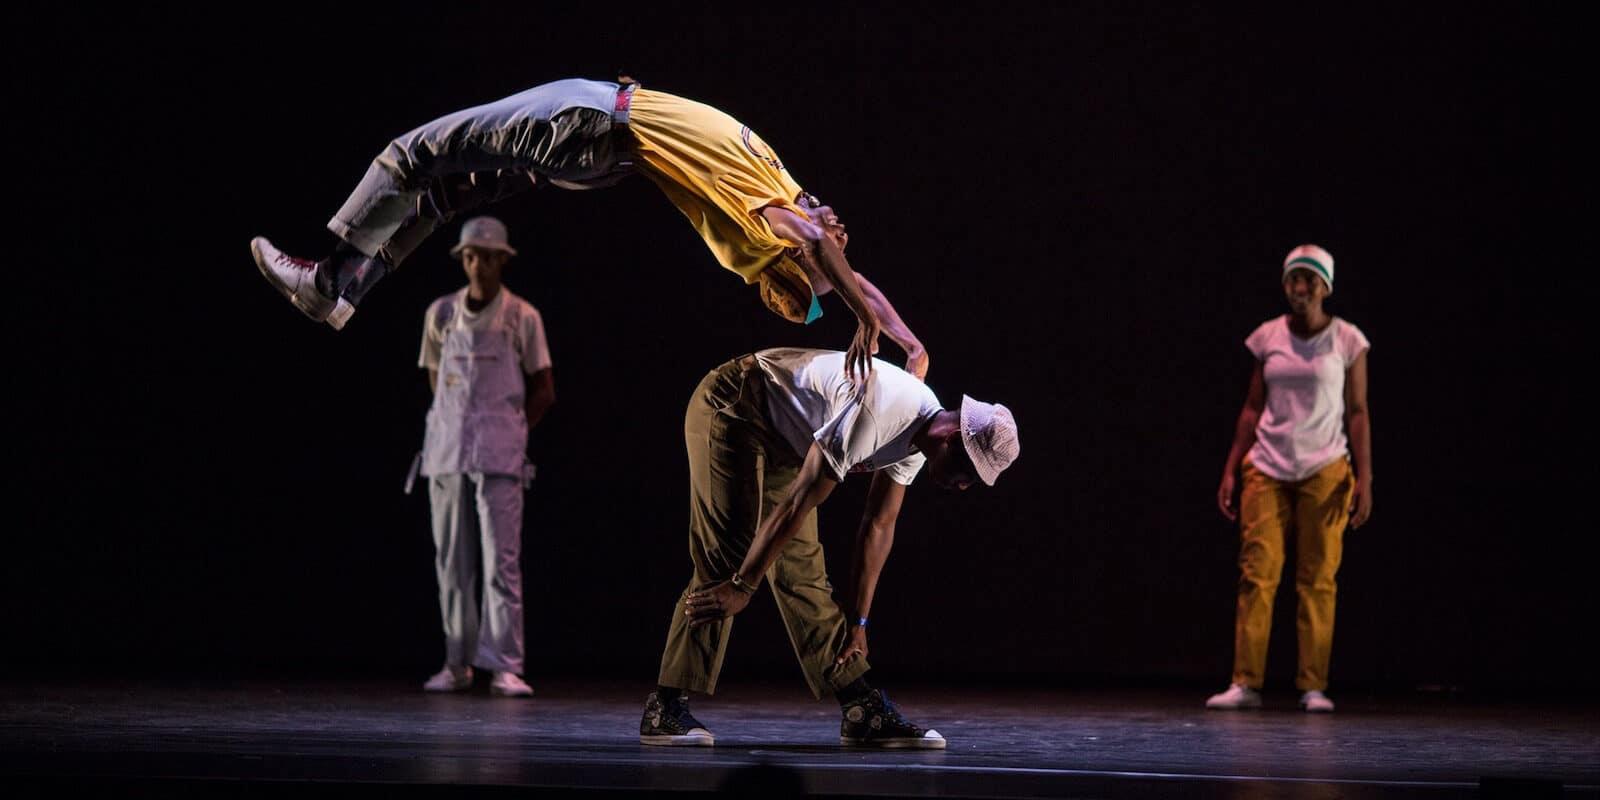 Image of dancers performing at Denver Arts Week in Colorado